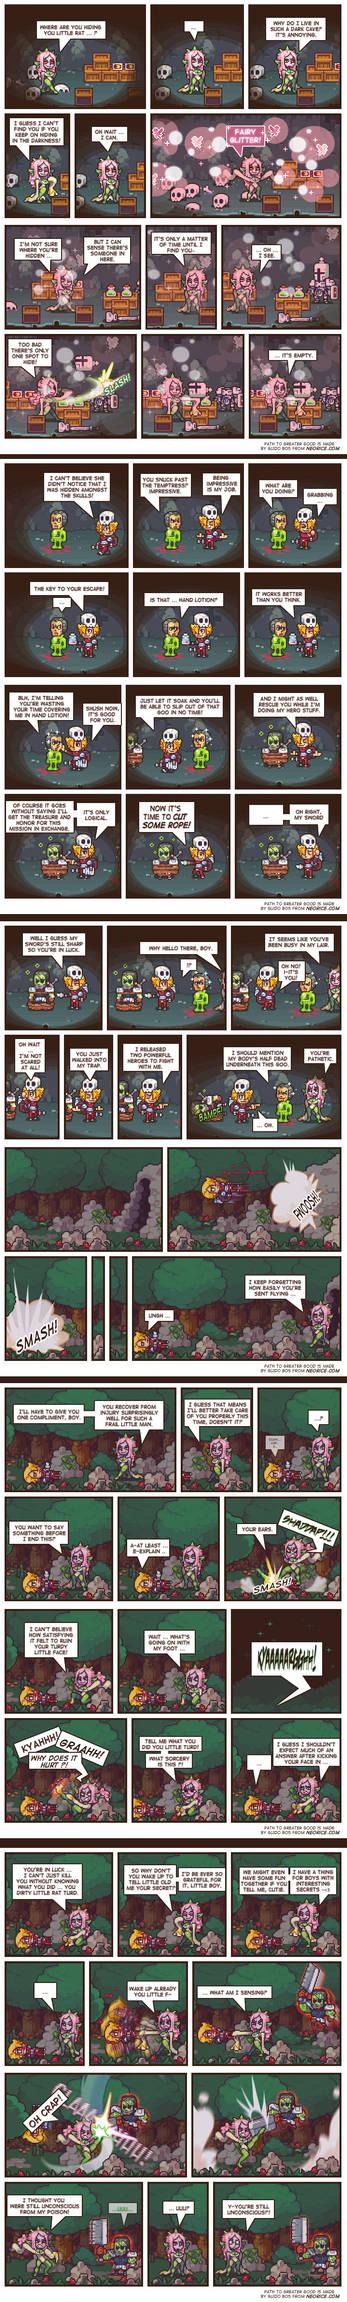 TOM RPG page 61-70